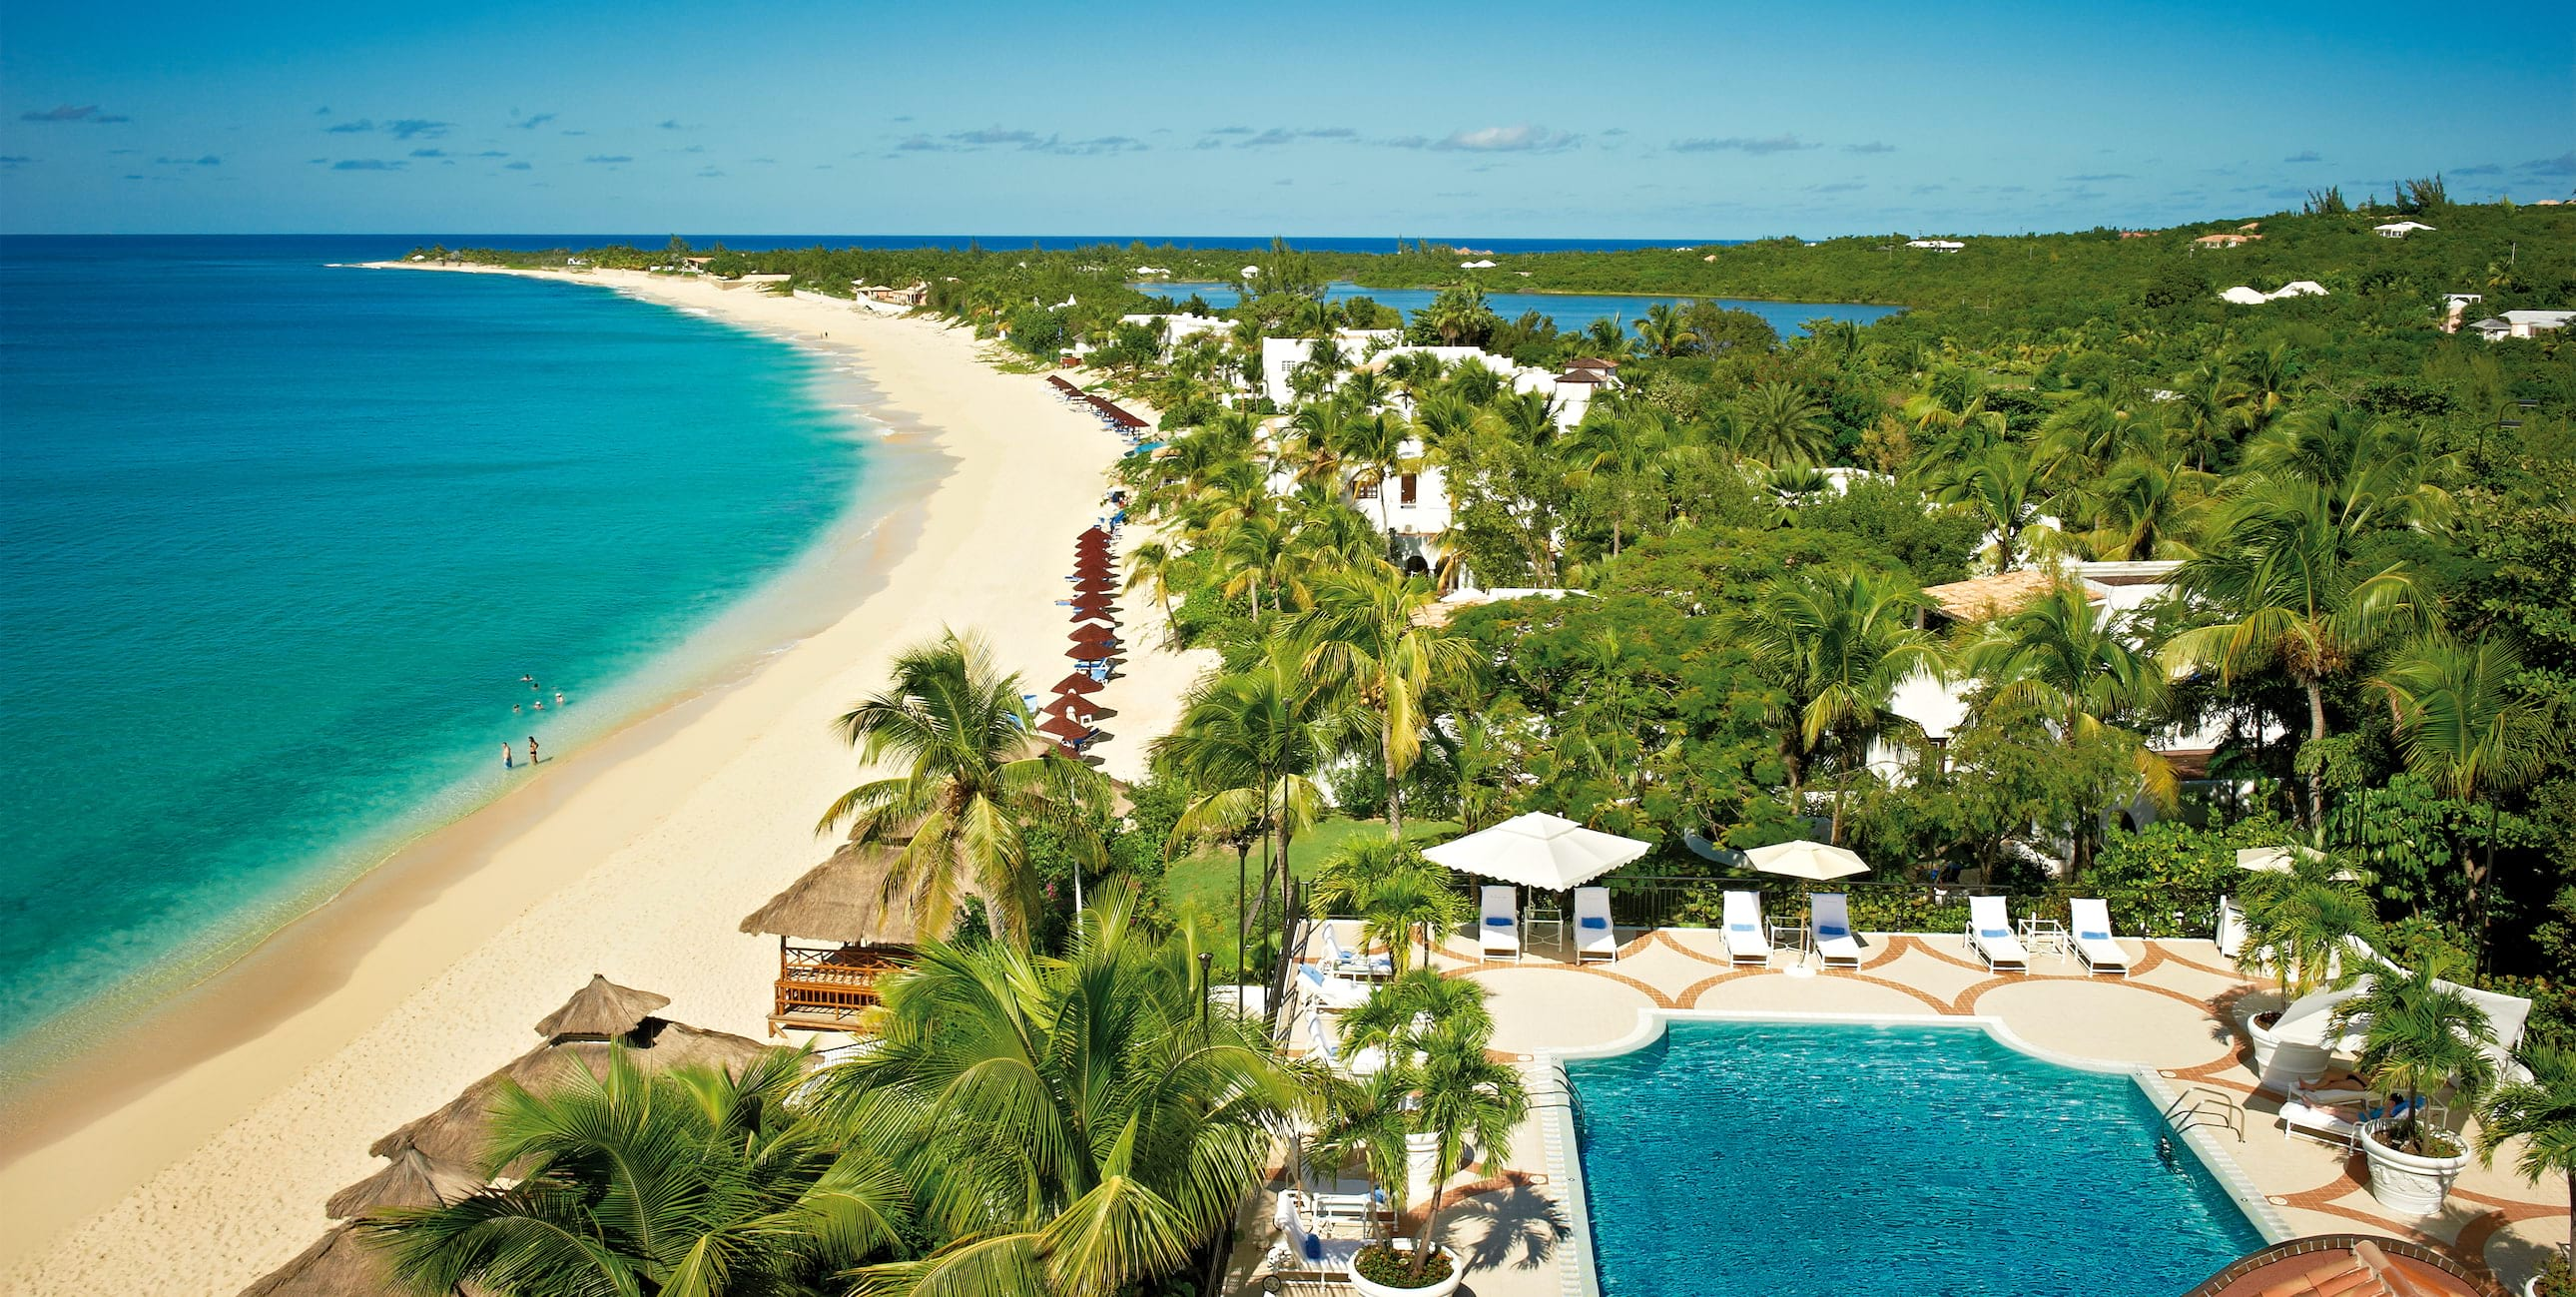 Belmond La Samanna | Luxury St. Martin Resorts